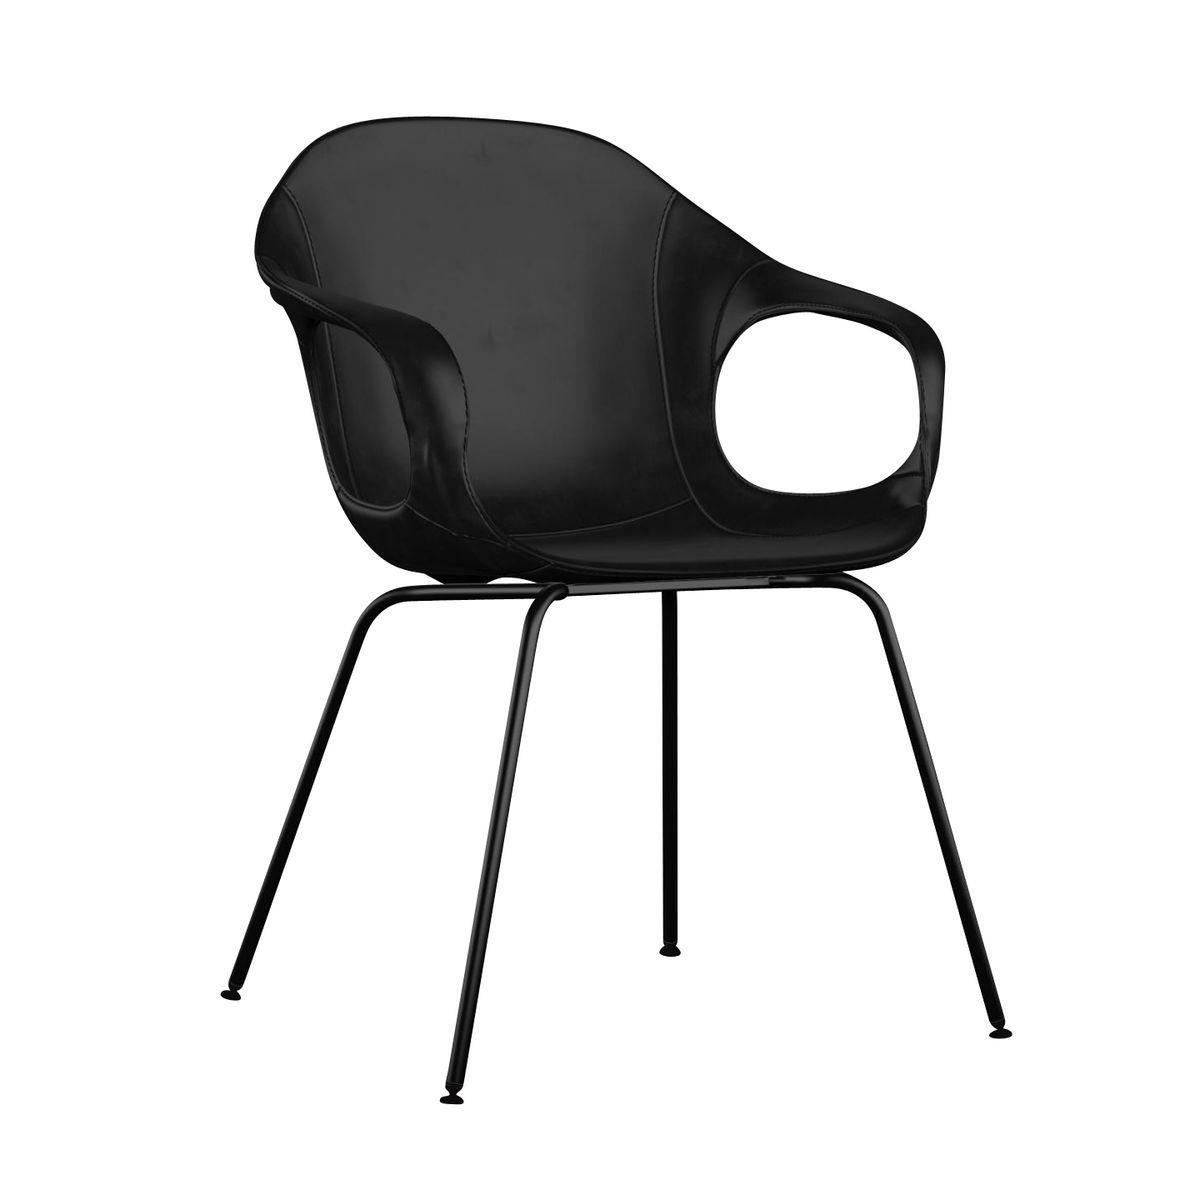 elephant armchair leather kristalia. Black Bedroom Furniture Sets. Home Design Ideas